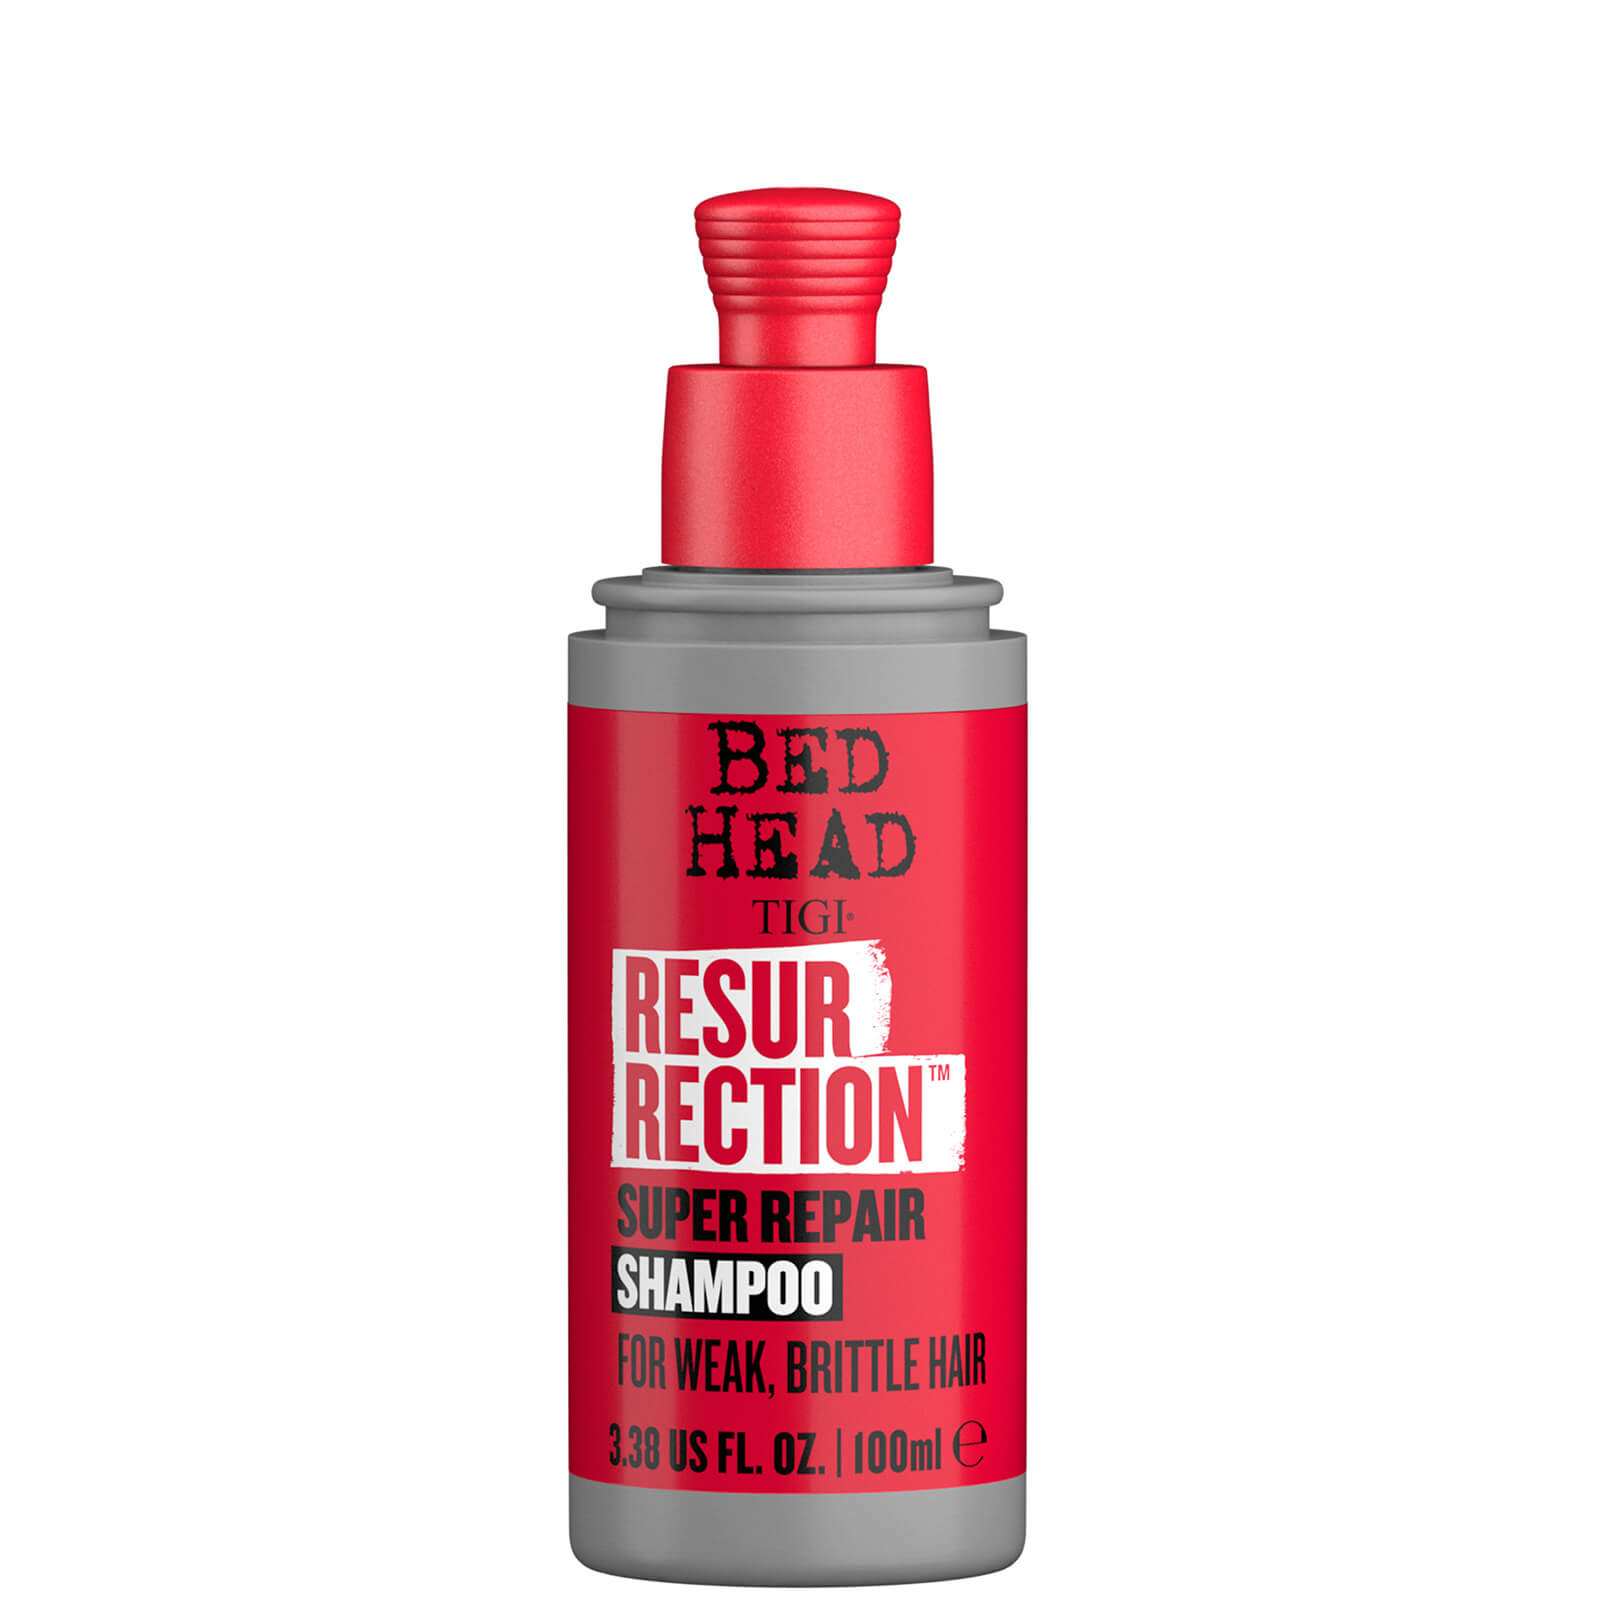 Купить TIGI Bed Head Resurrection Repair Shampoo for Damaged Hair Travel Size 100ml